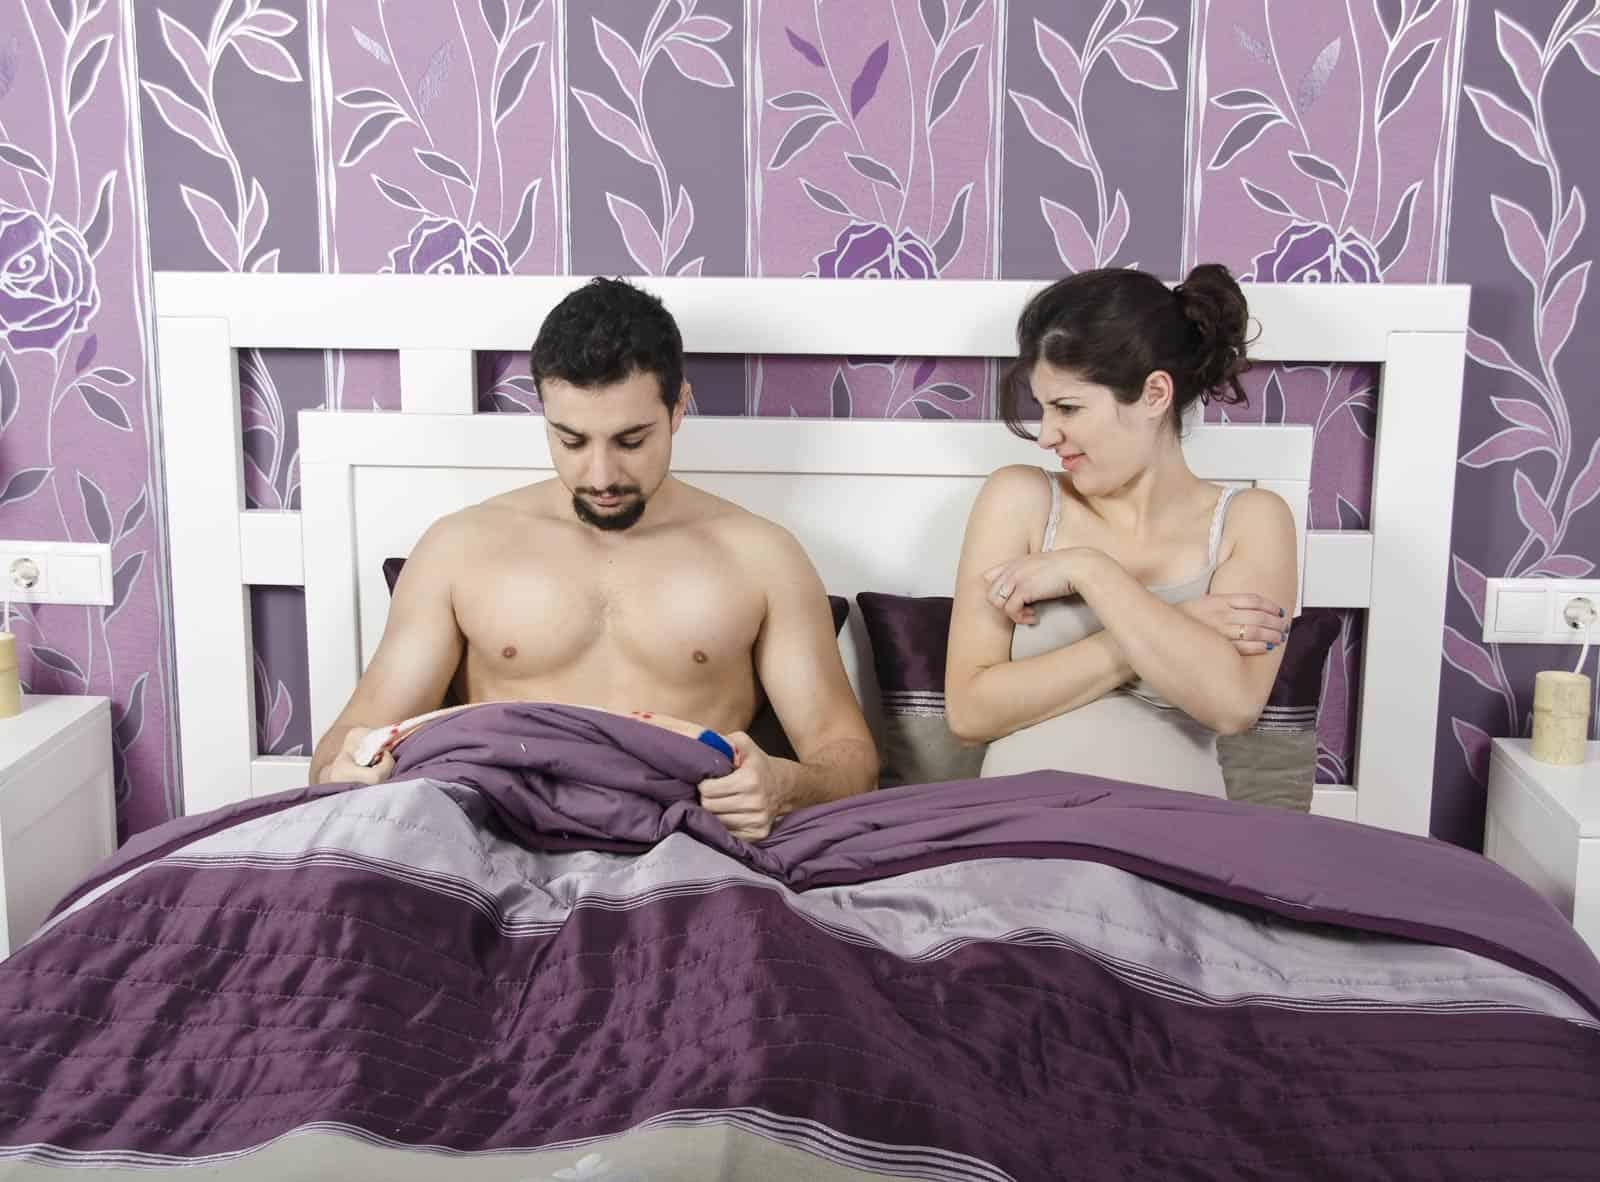 Problemi s dizanjem spolnog organa